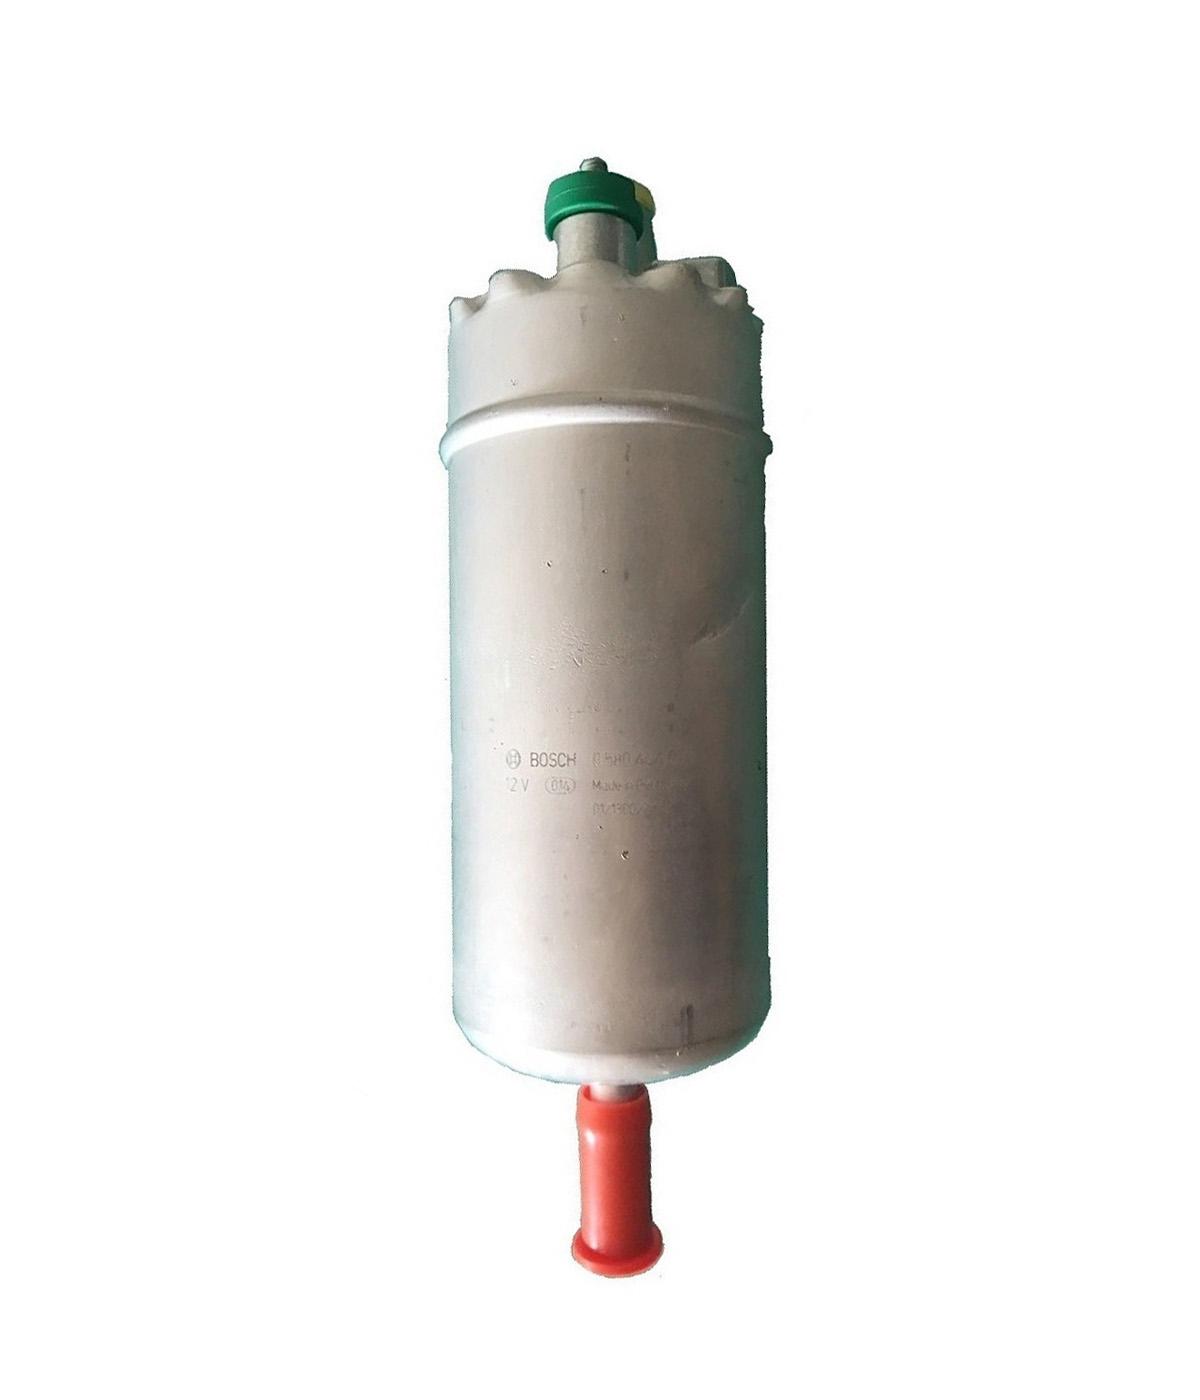 Bomba Combustível Elétrica Vw Delivery 5140 8150 - 12V